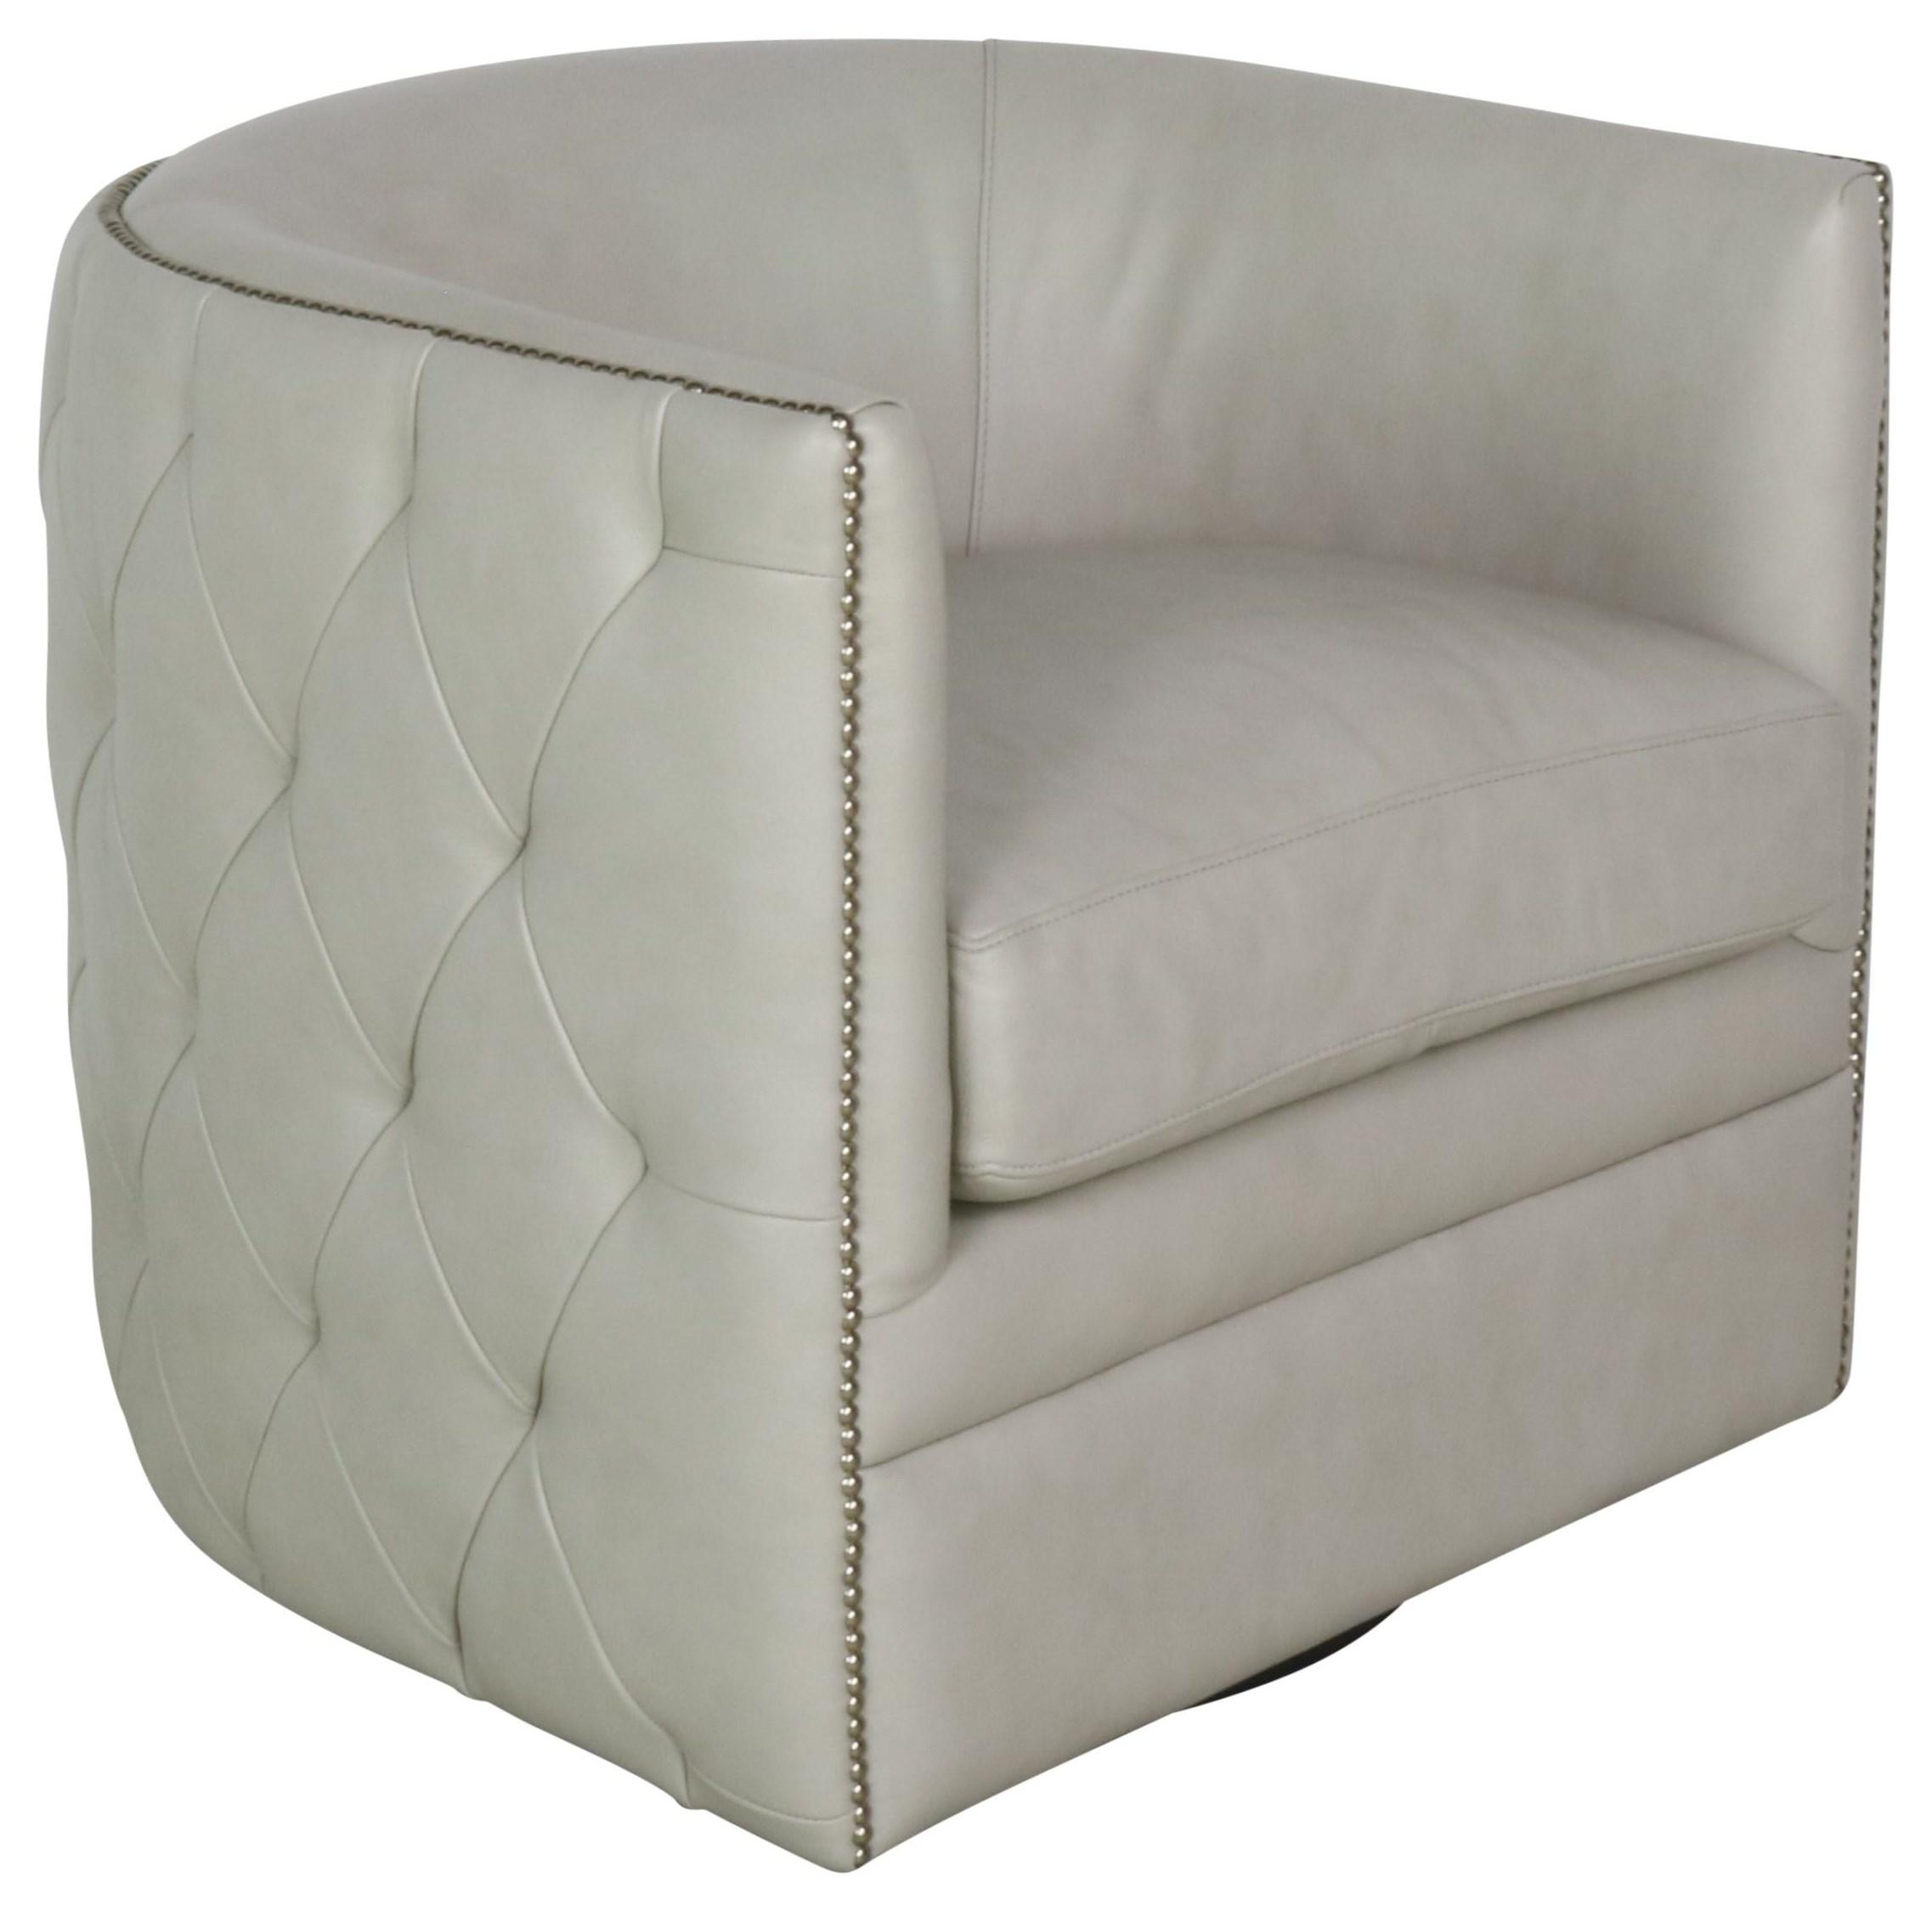 SPRINTZ BERFU Swivel Chair by Bernhardt at Sprintz Furniture